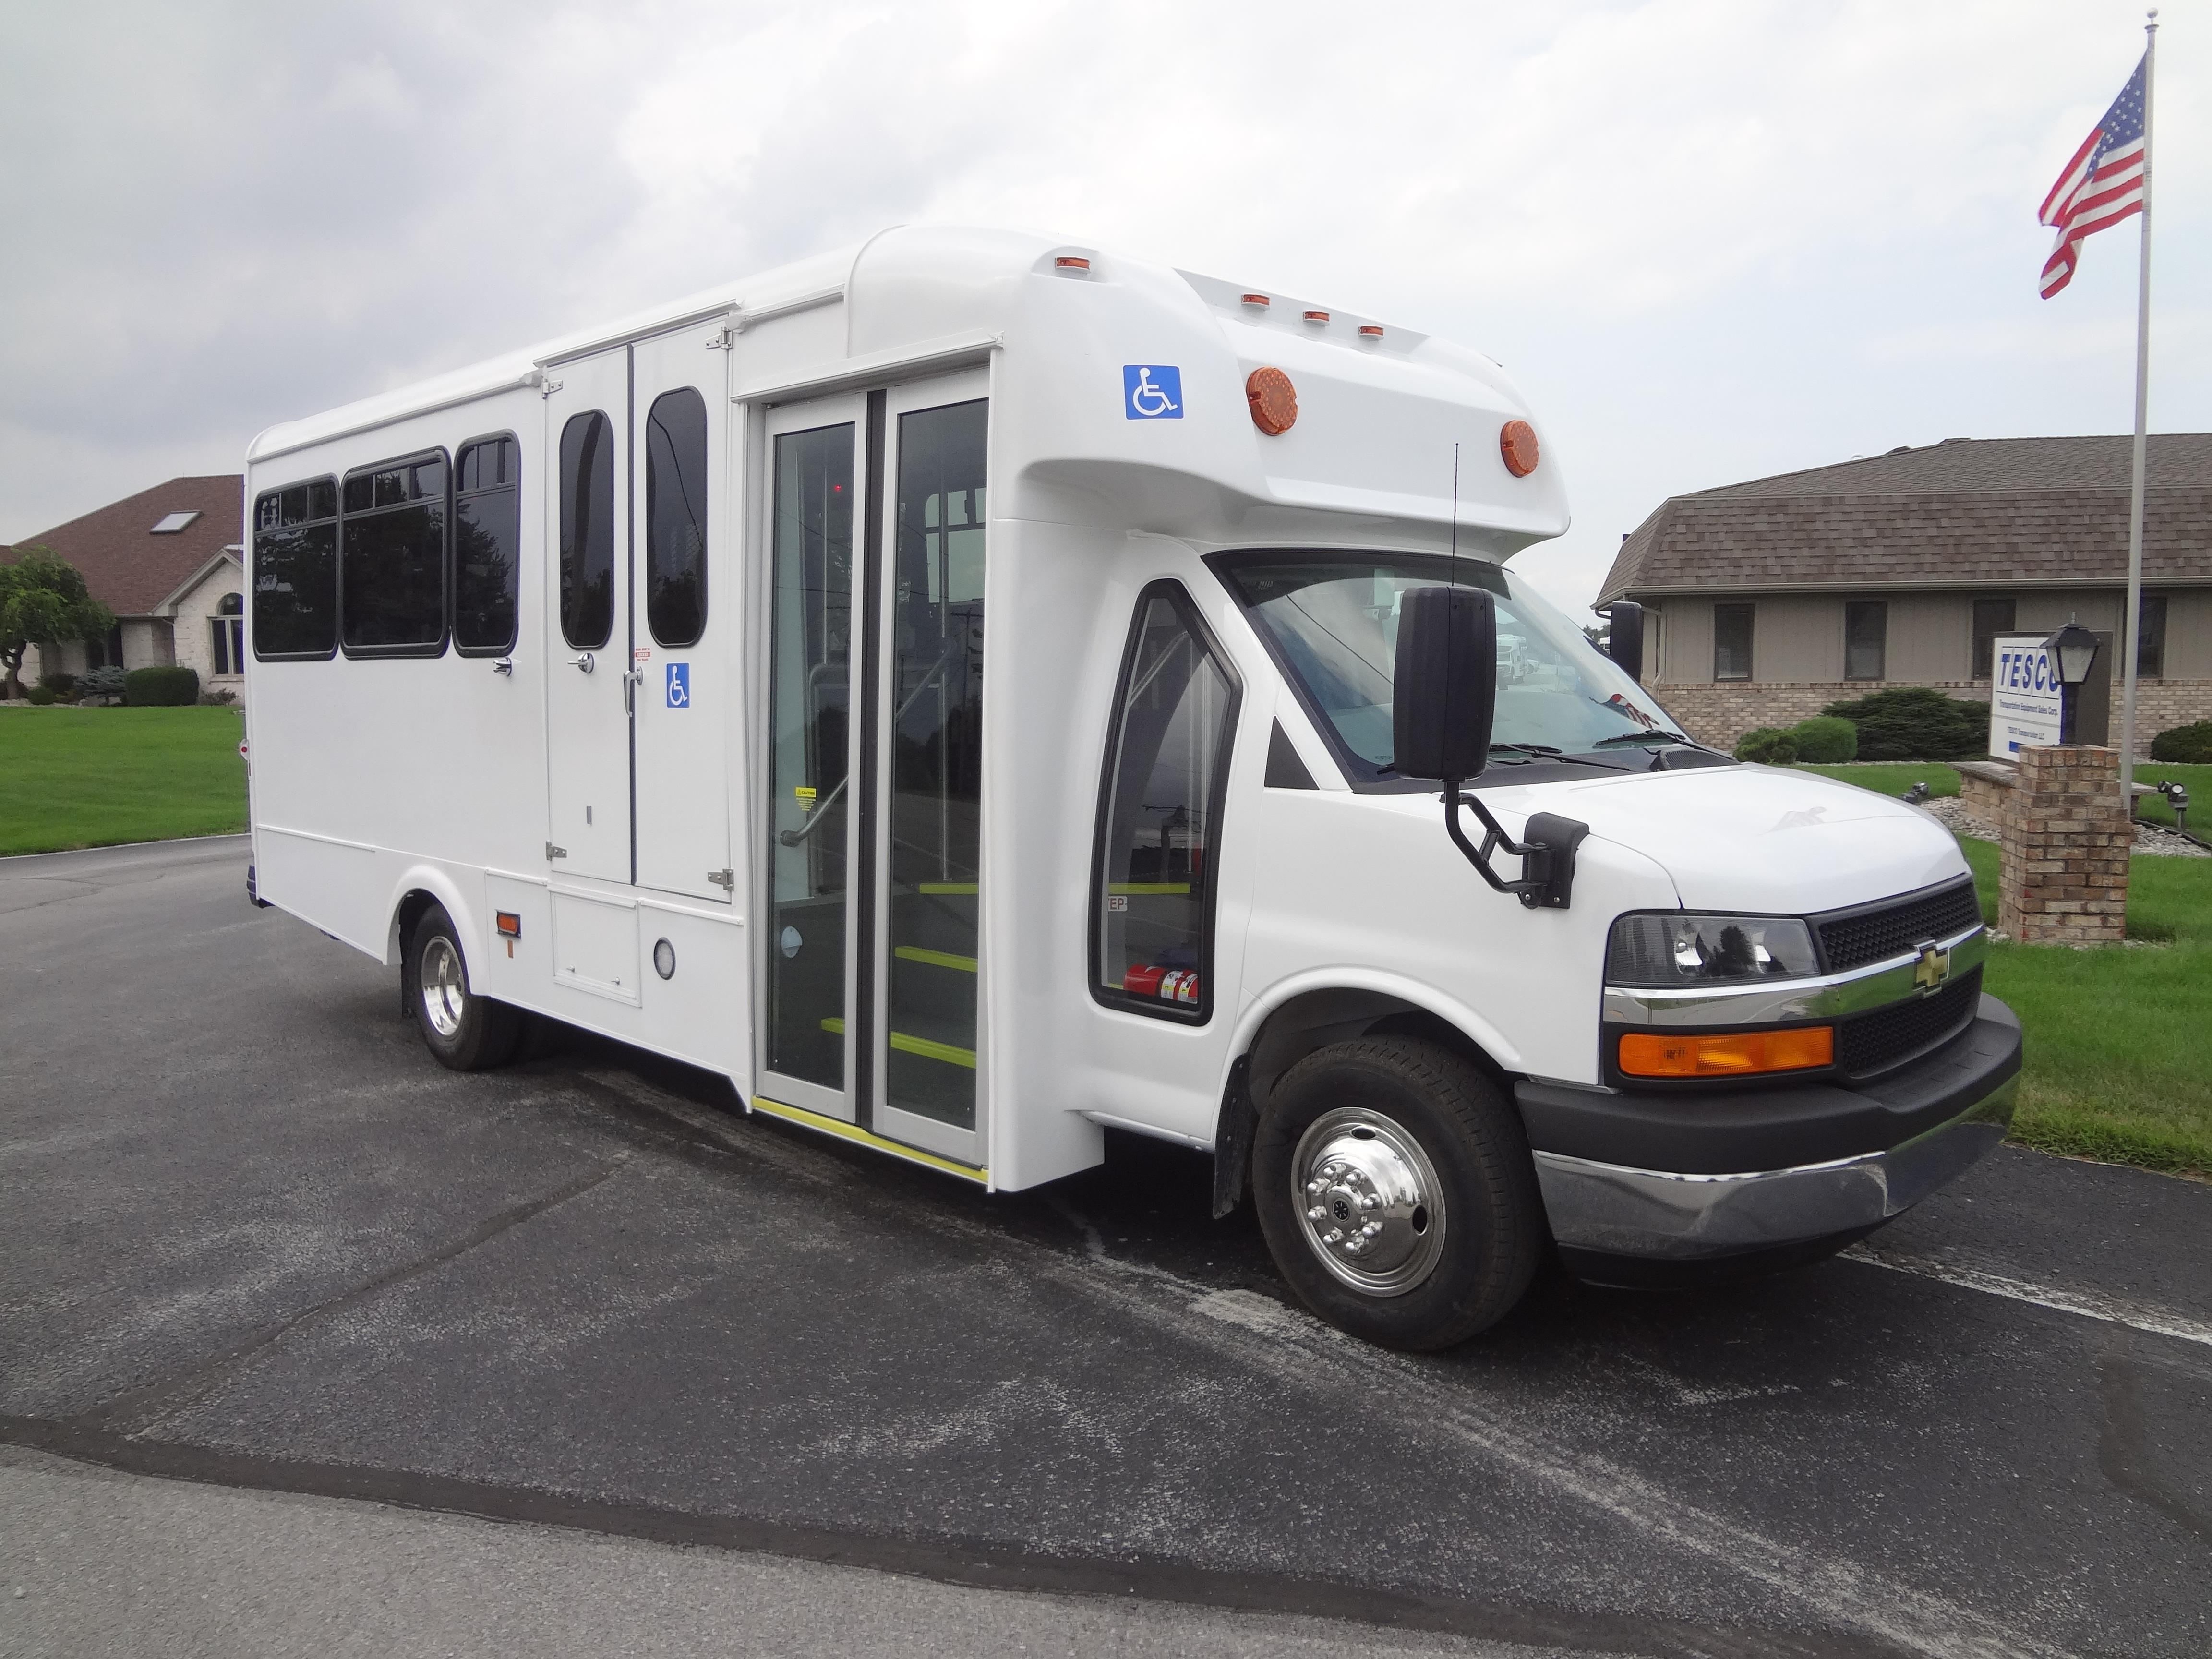 [FPER_4992]  2018 Glaval Titan II Chevrolet 11 Passengers and 3 Wheelchairs | Glaval Bus Wiring Diagram |  | Tesco Bus